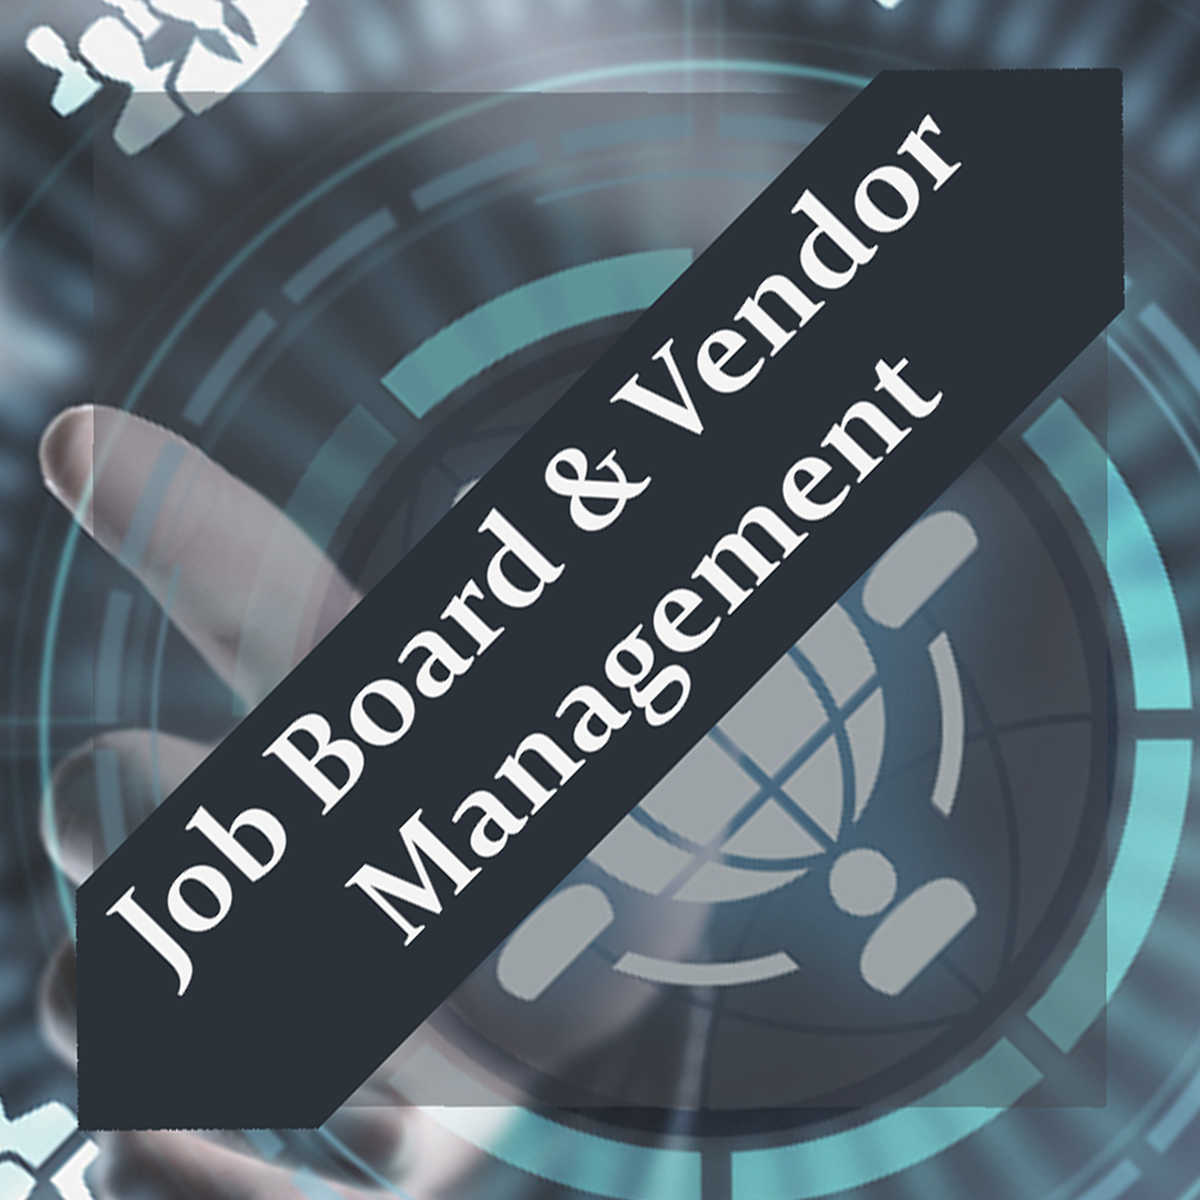 Job Board Software & Vendor Management Systems